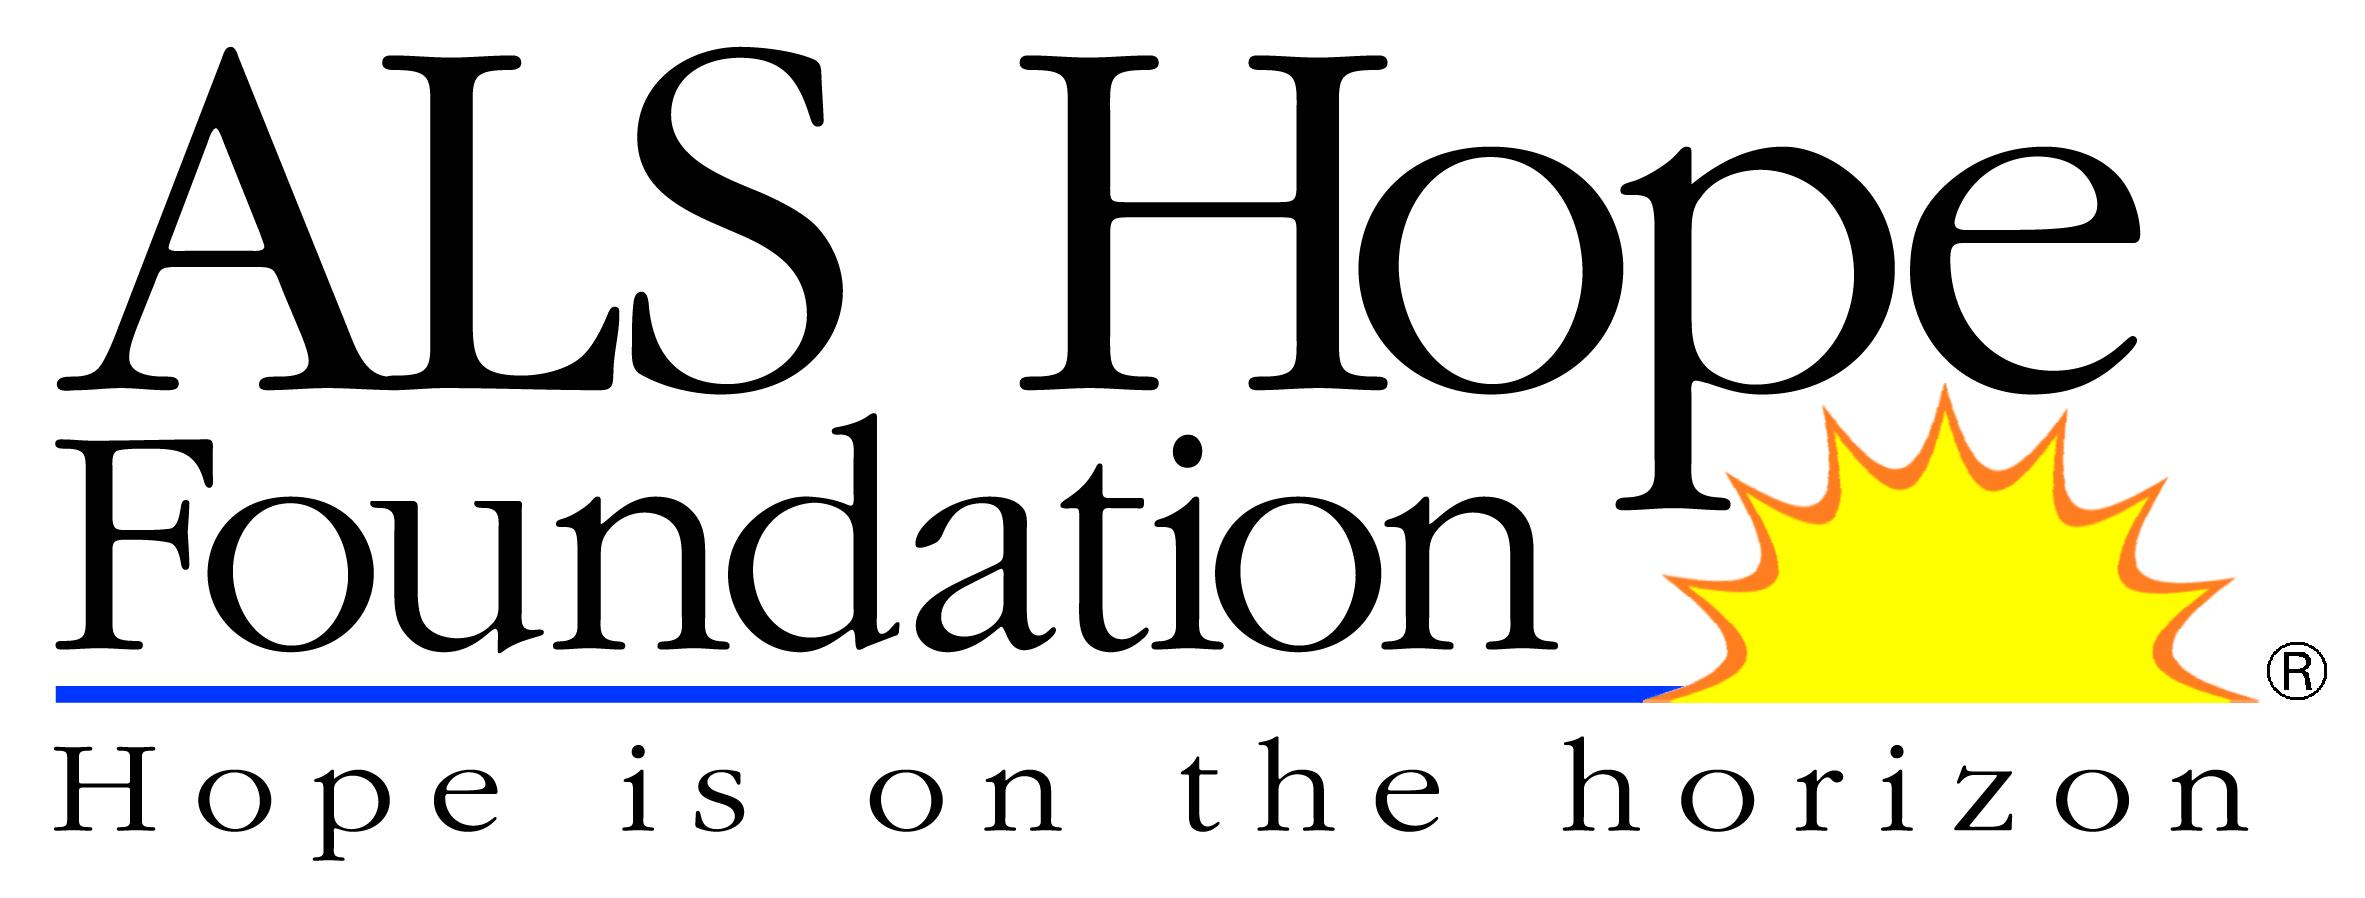 ALSHF Logo R.jpg